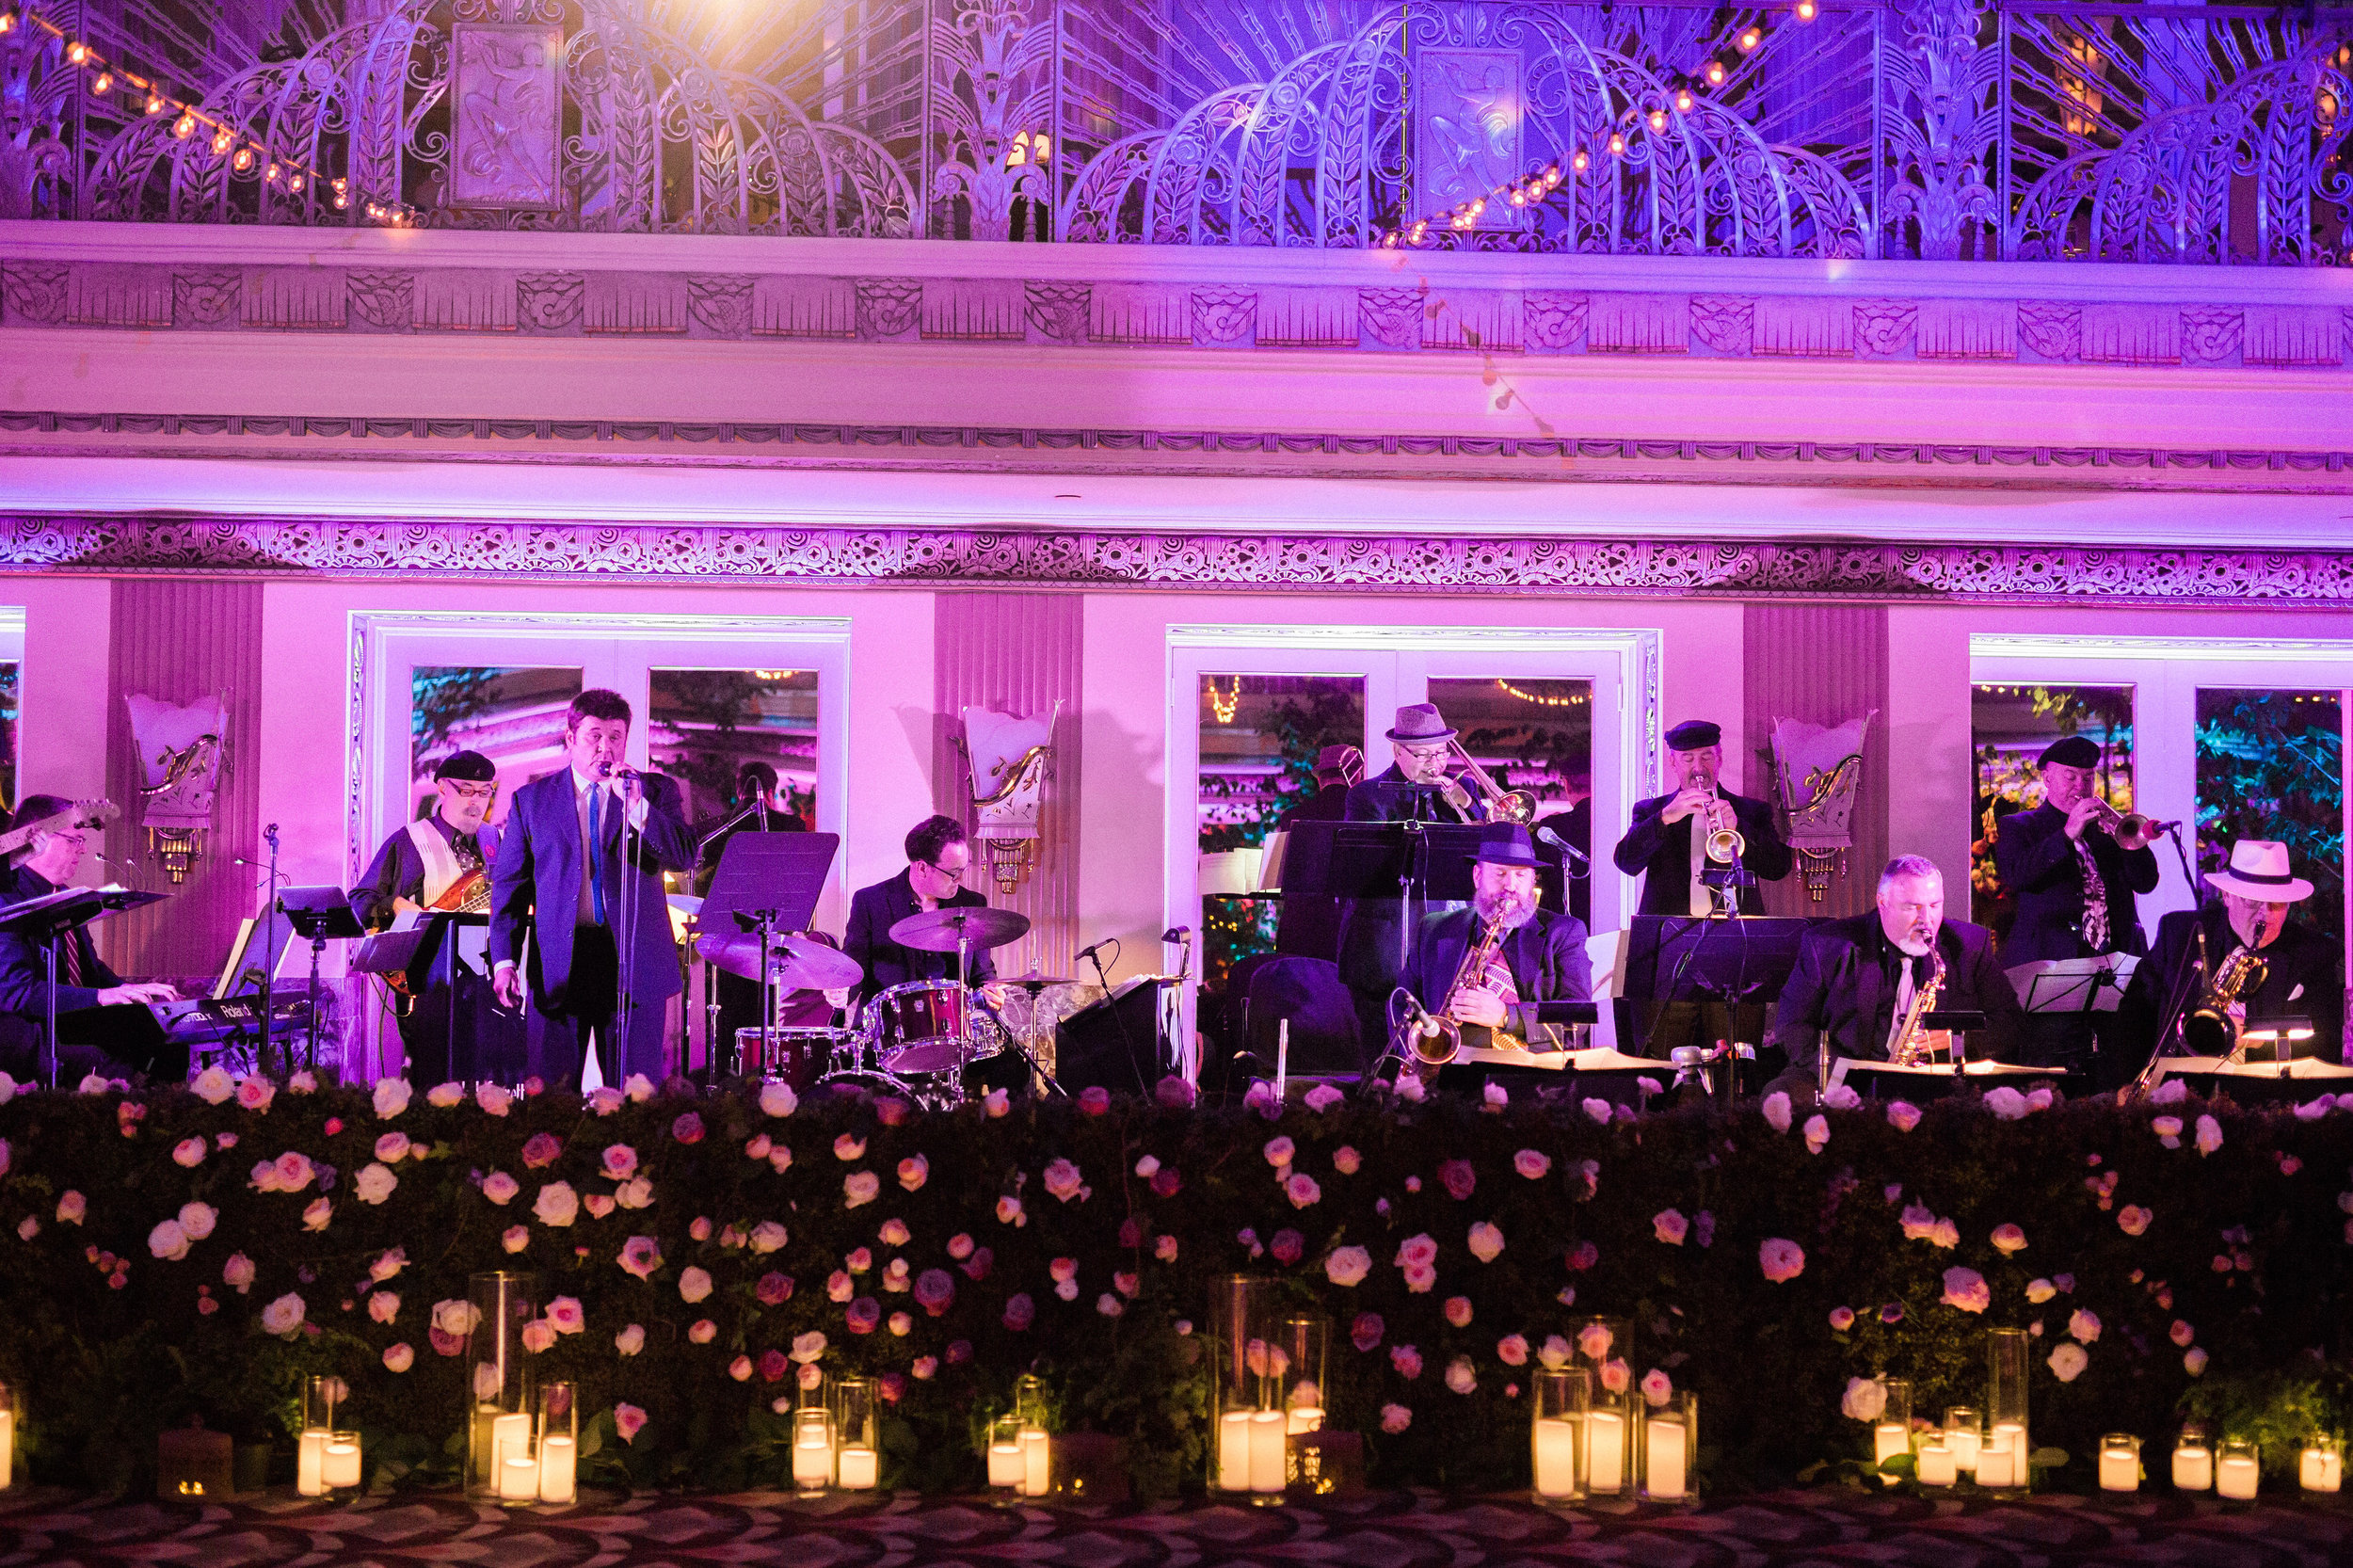 Band Shot at Reception at The Hilton Netherland Plaza Hotel Hall of Mirrors Cincinati, OH